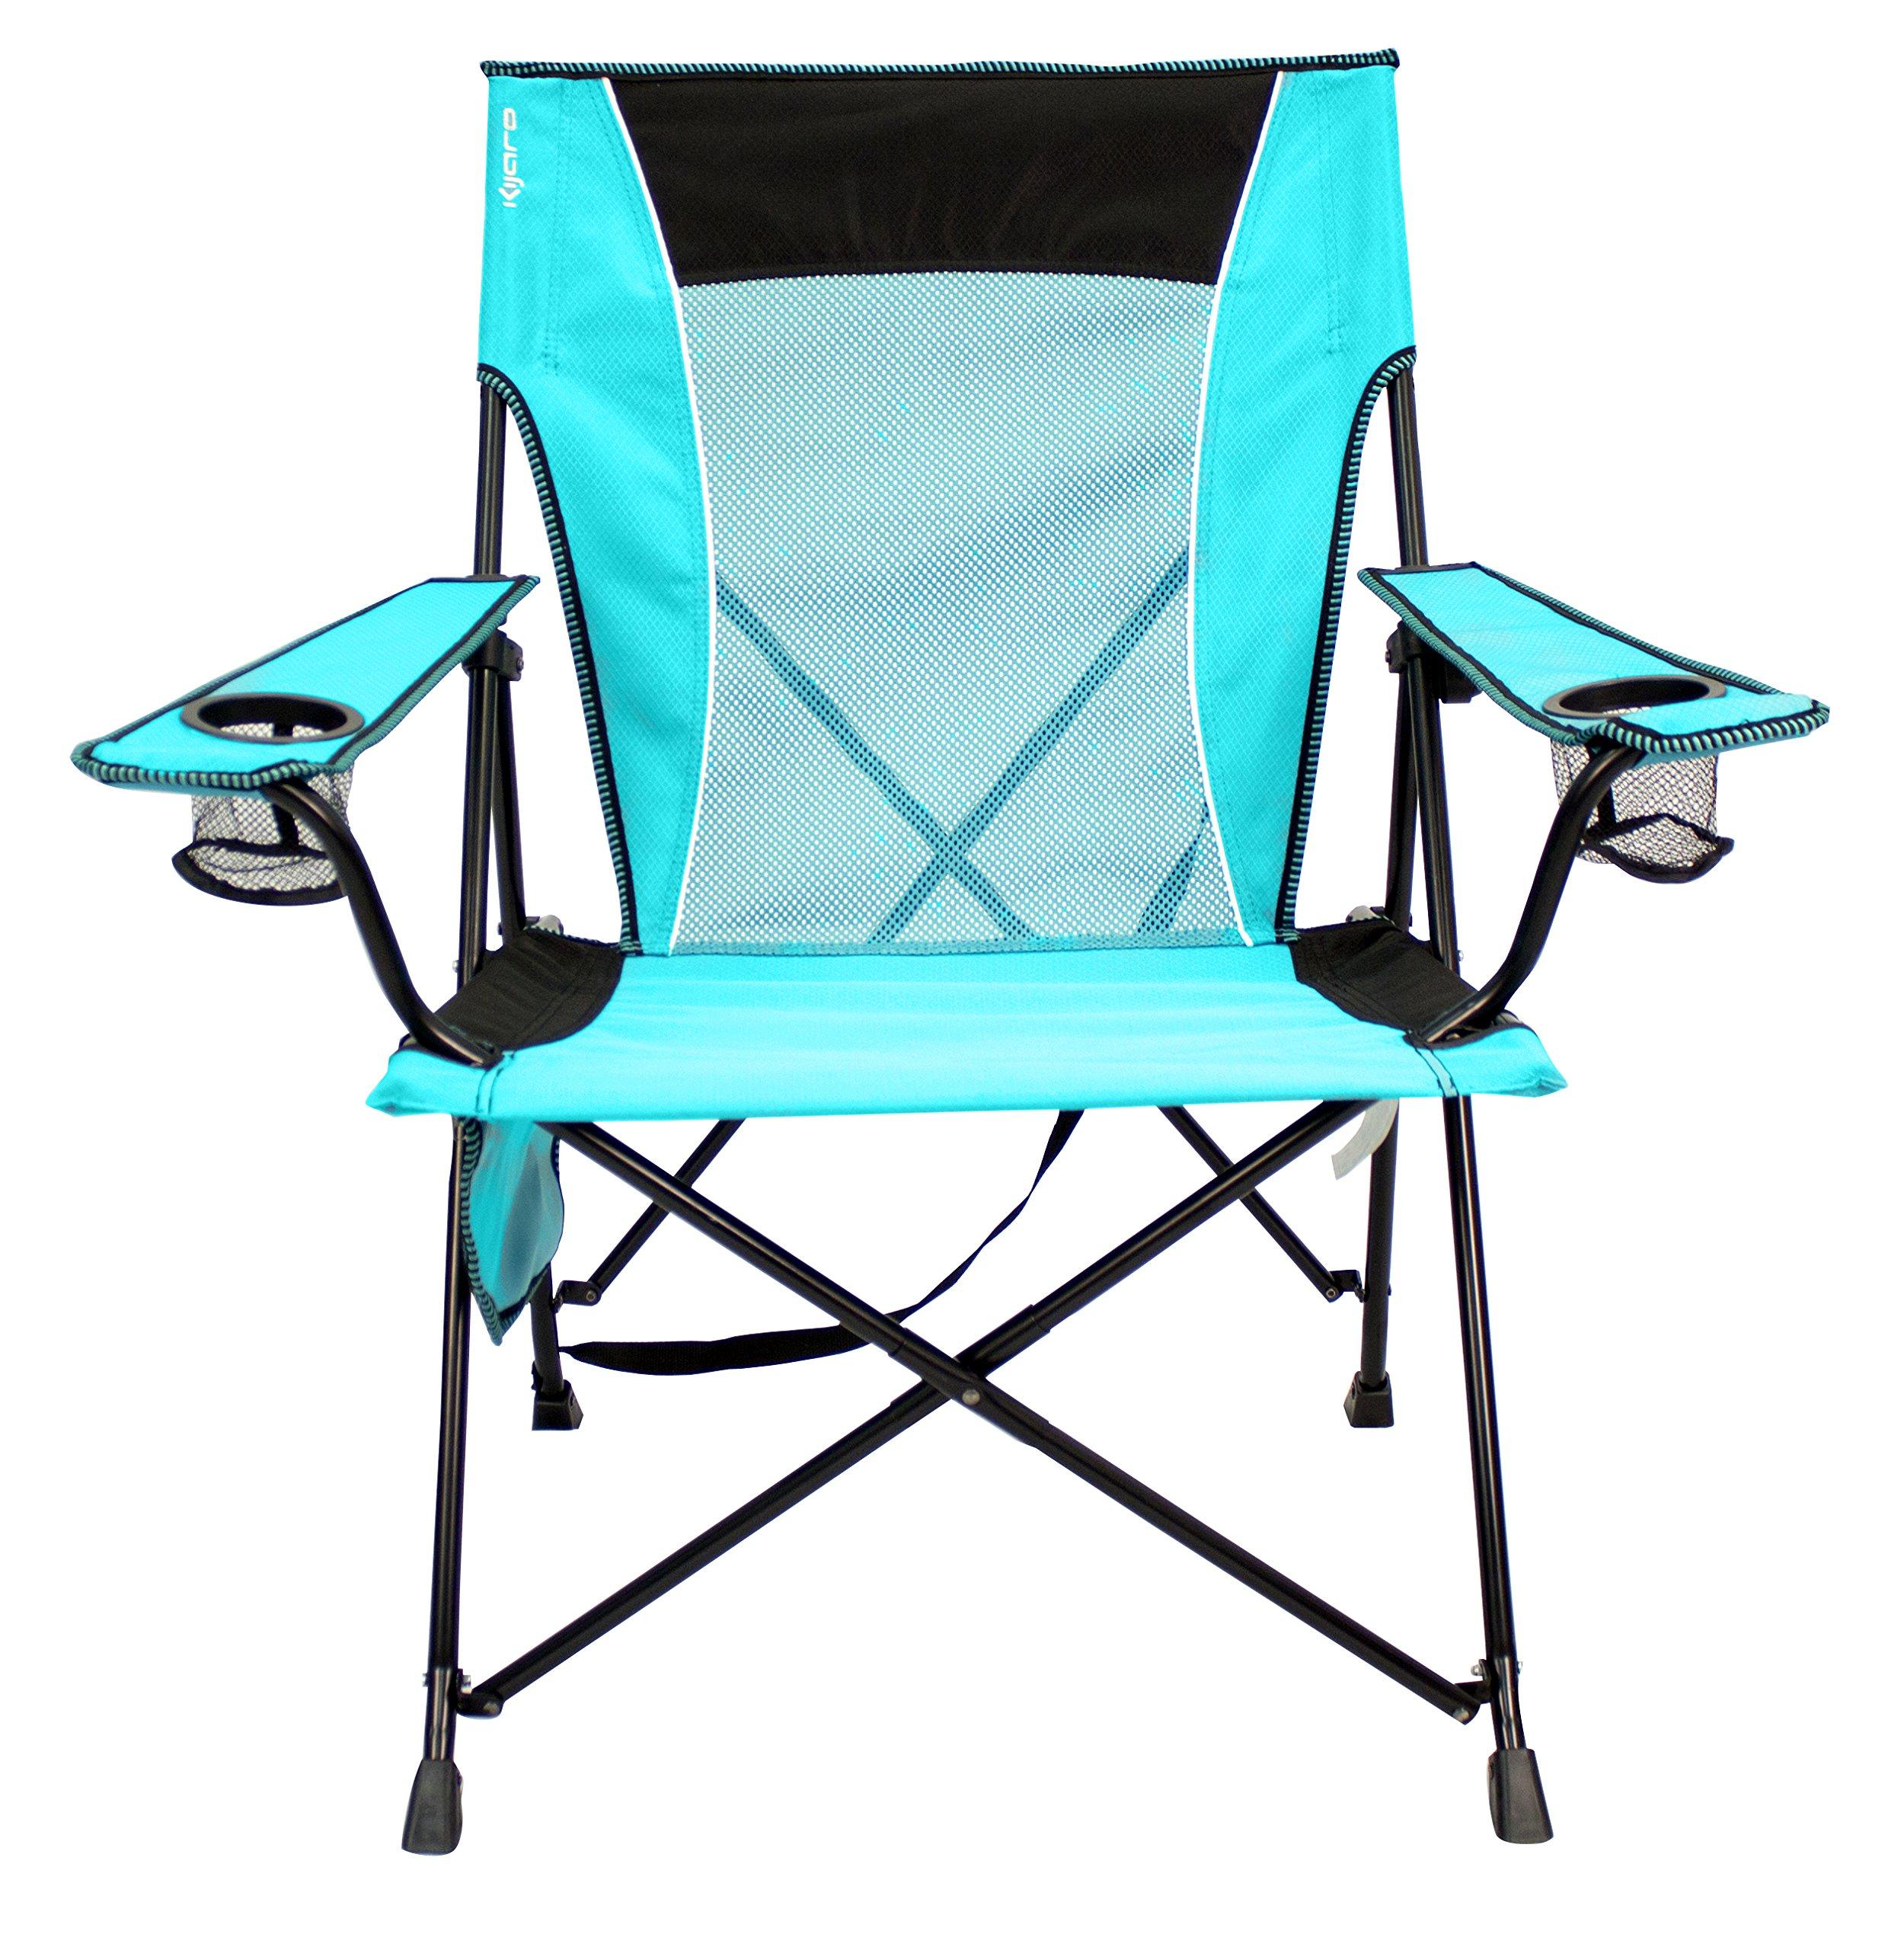 Kijaro  Dual Lock Portable Camping and Sports Chair by Kijaro